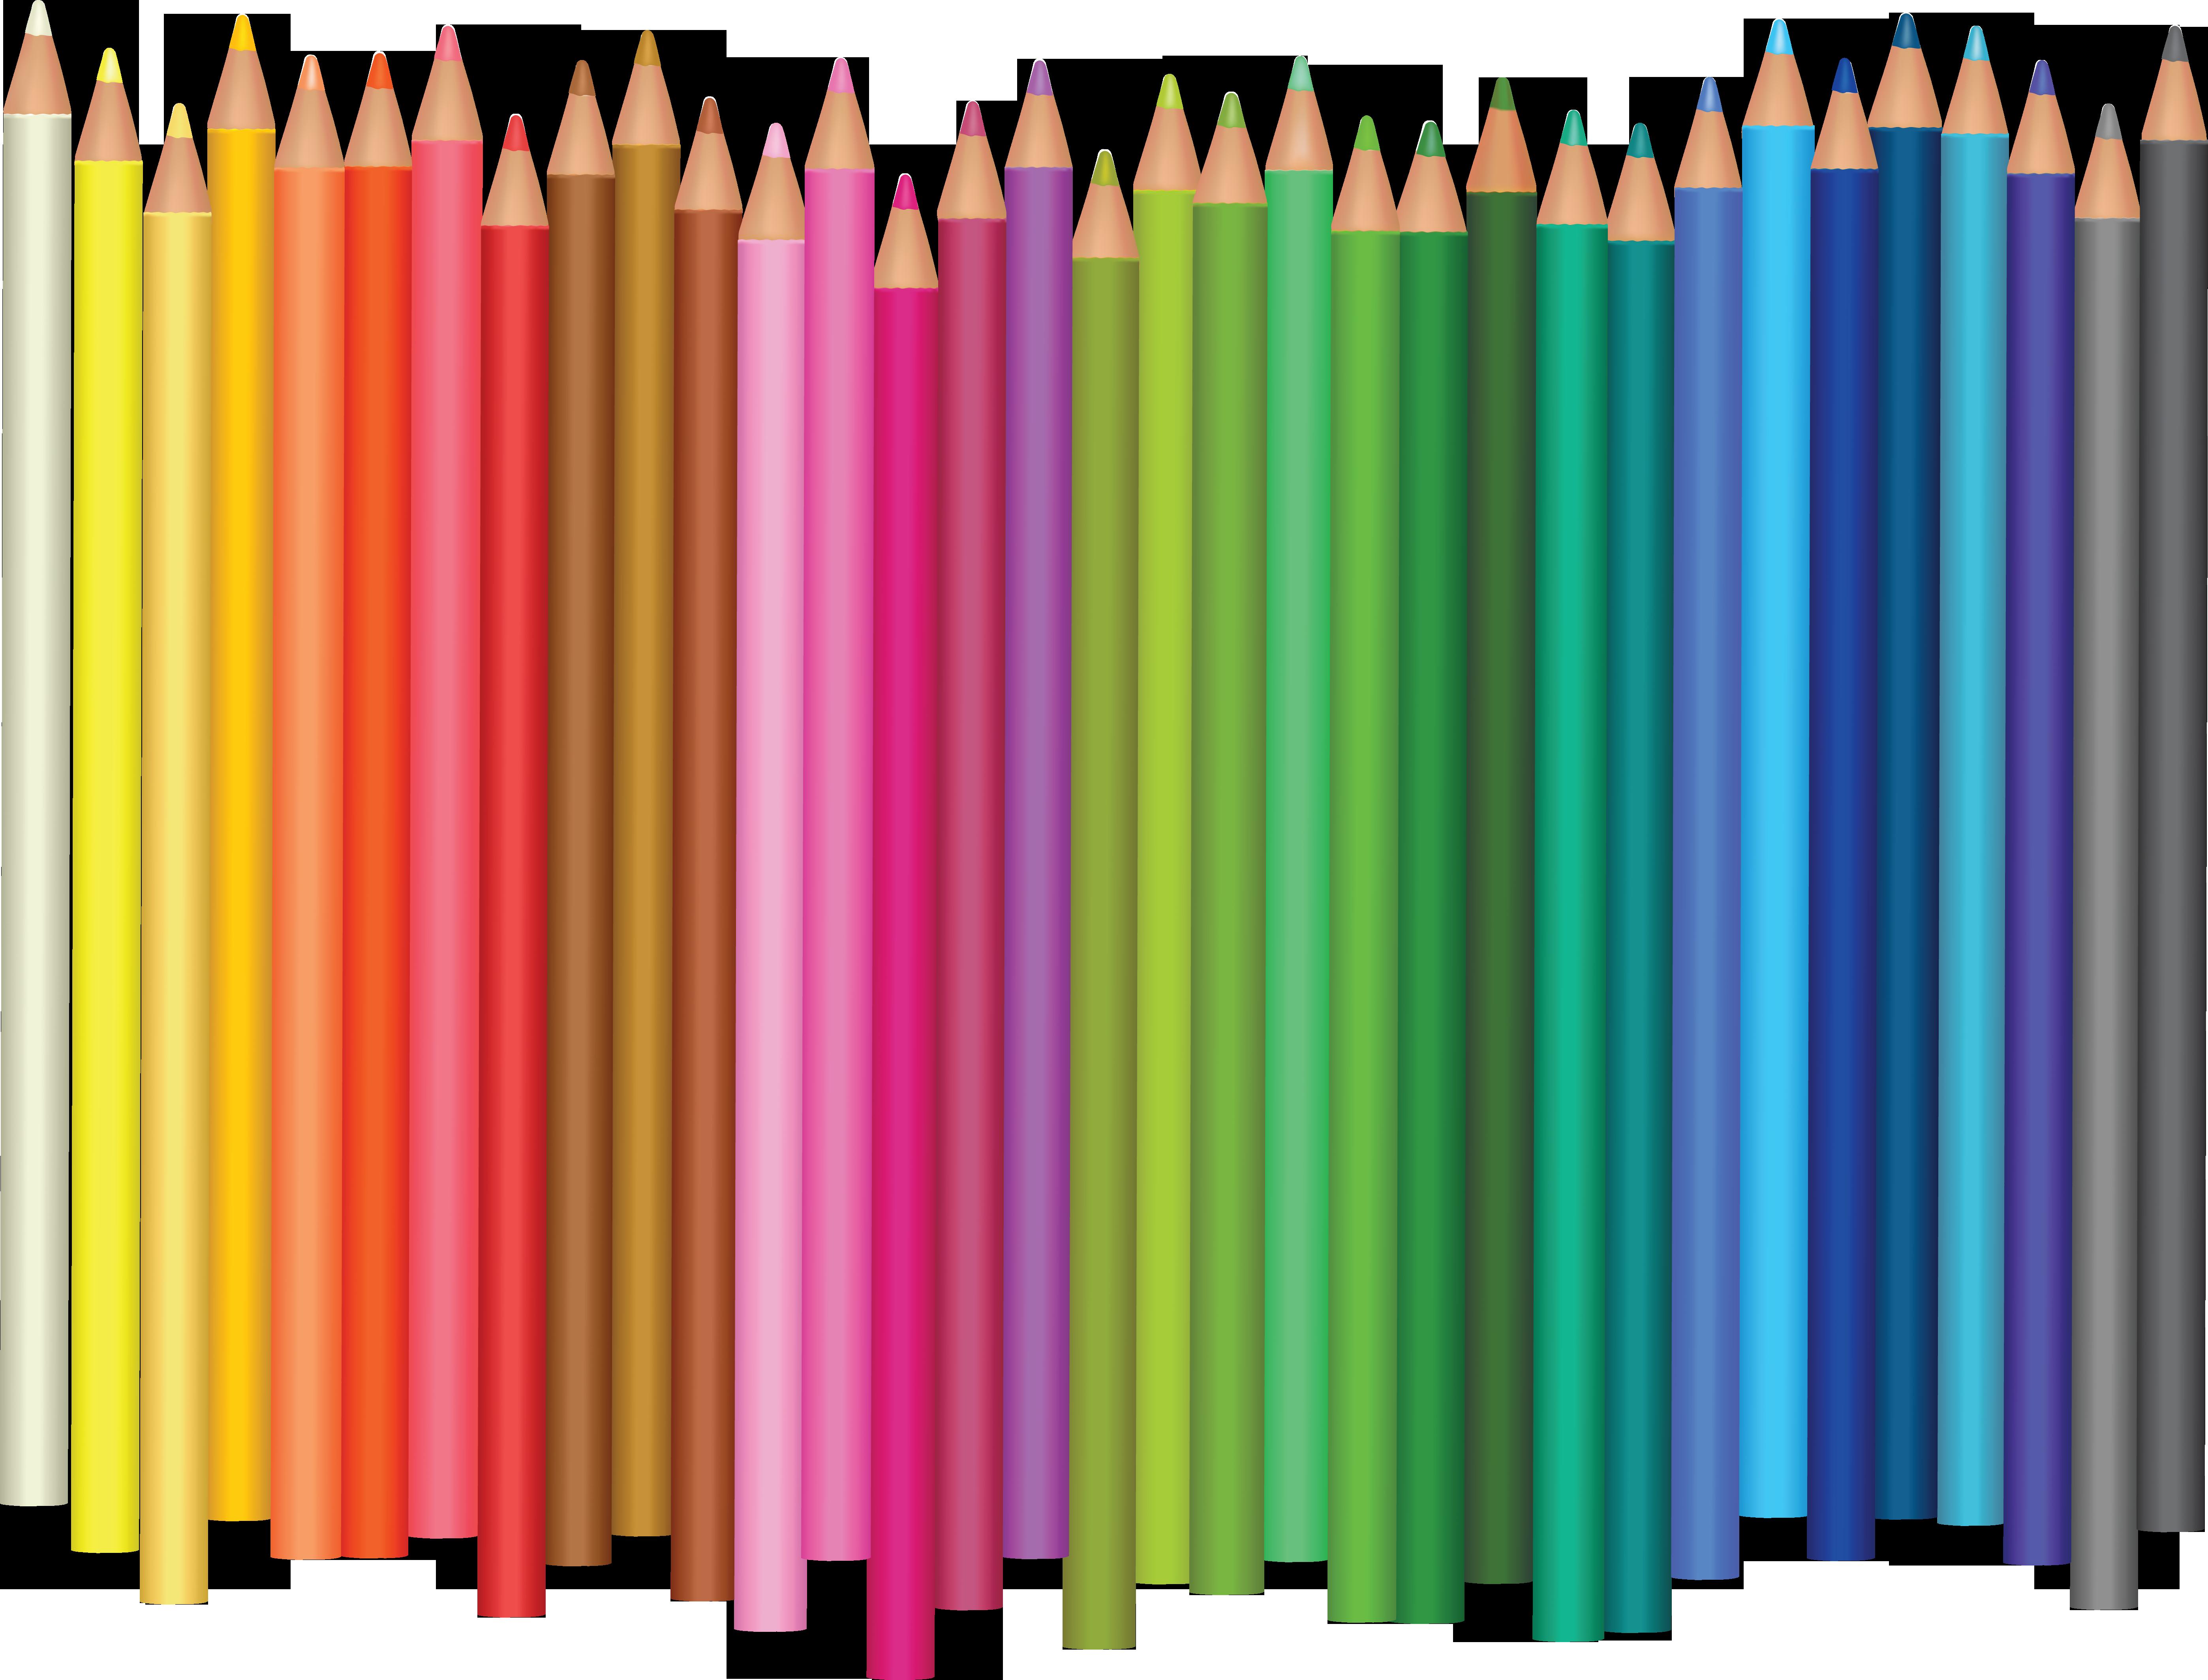 Transparent colored pencils clipart - Color S Png Image Purepng Free Transparent Ⓒ - Transparent Colored Pencils Png